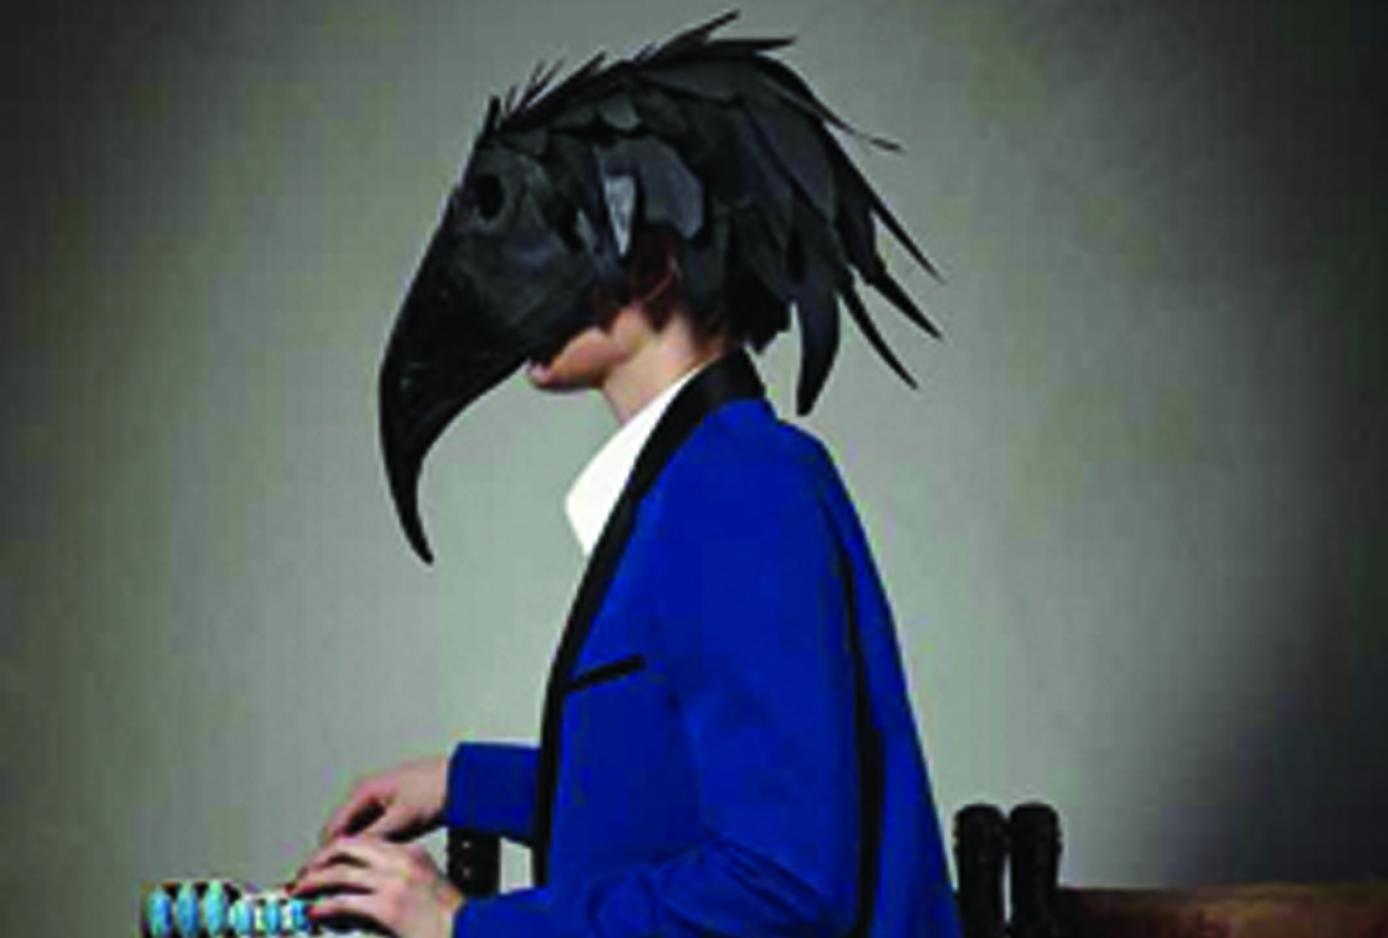 Animal_Heads_cover.jpg